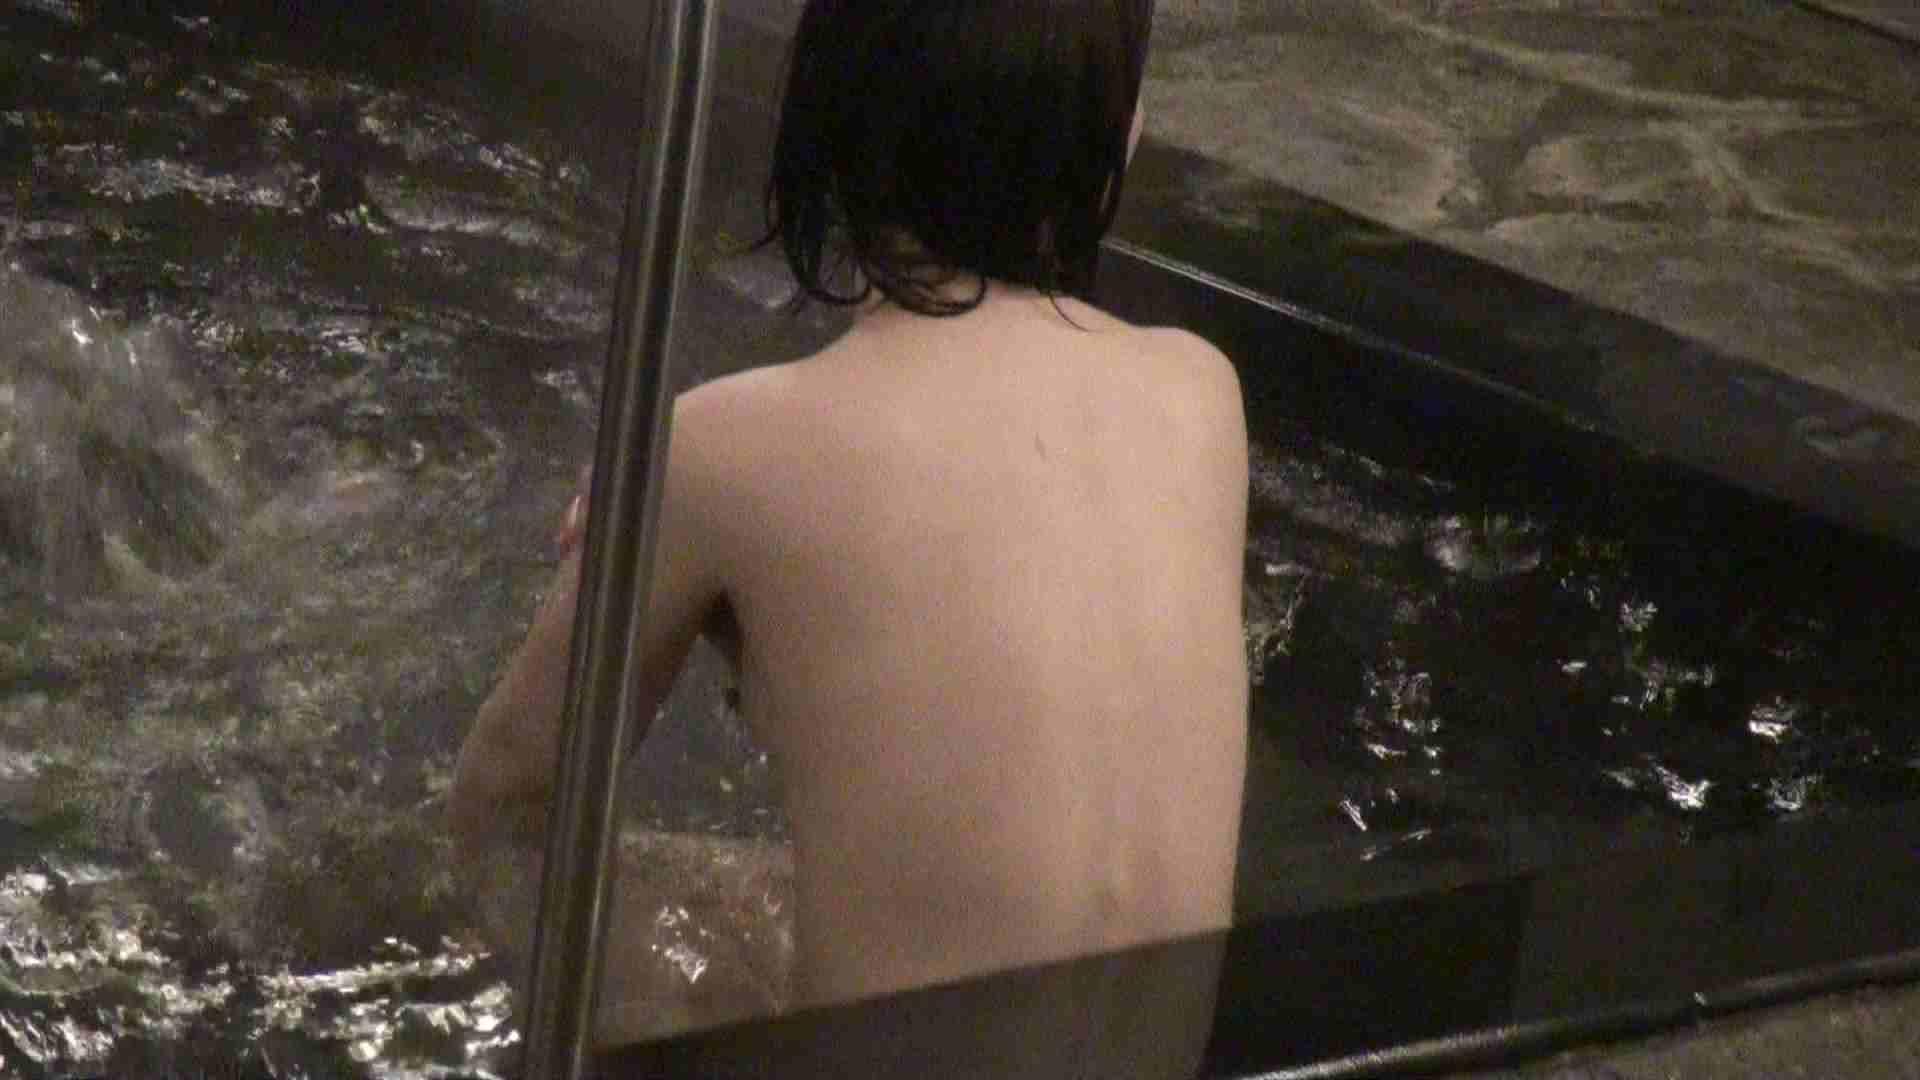 Aquaな露天風呂Vol.404 エッチな盗撮 盗み撮り動画 112pic 38